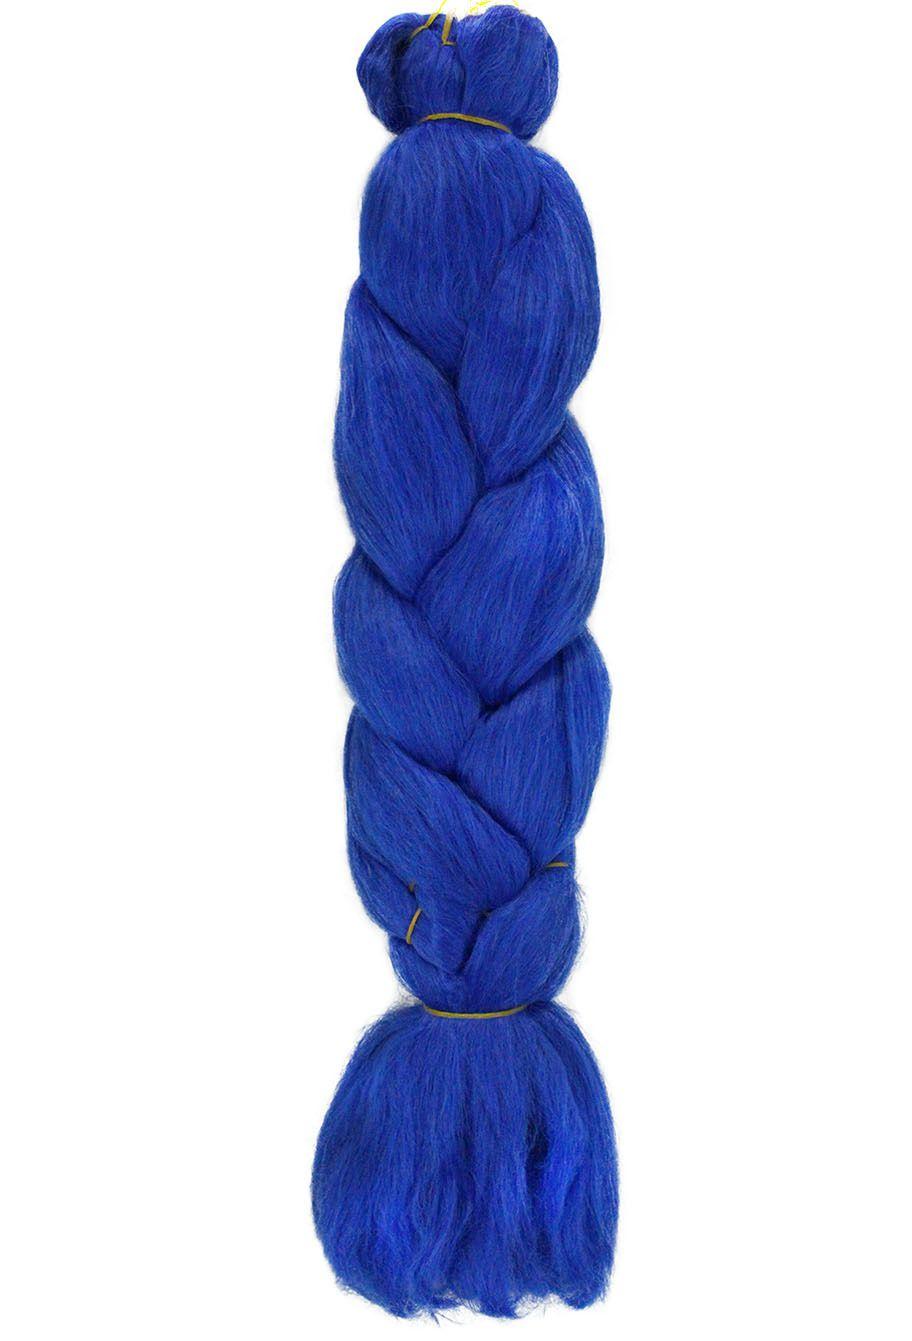 Jumbo - Pacotão Modern Girl (400g) - Cor: Azul (BLUE)